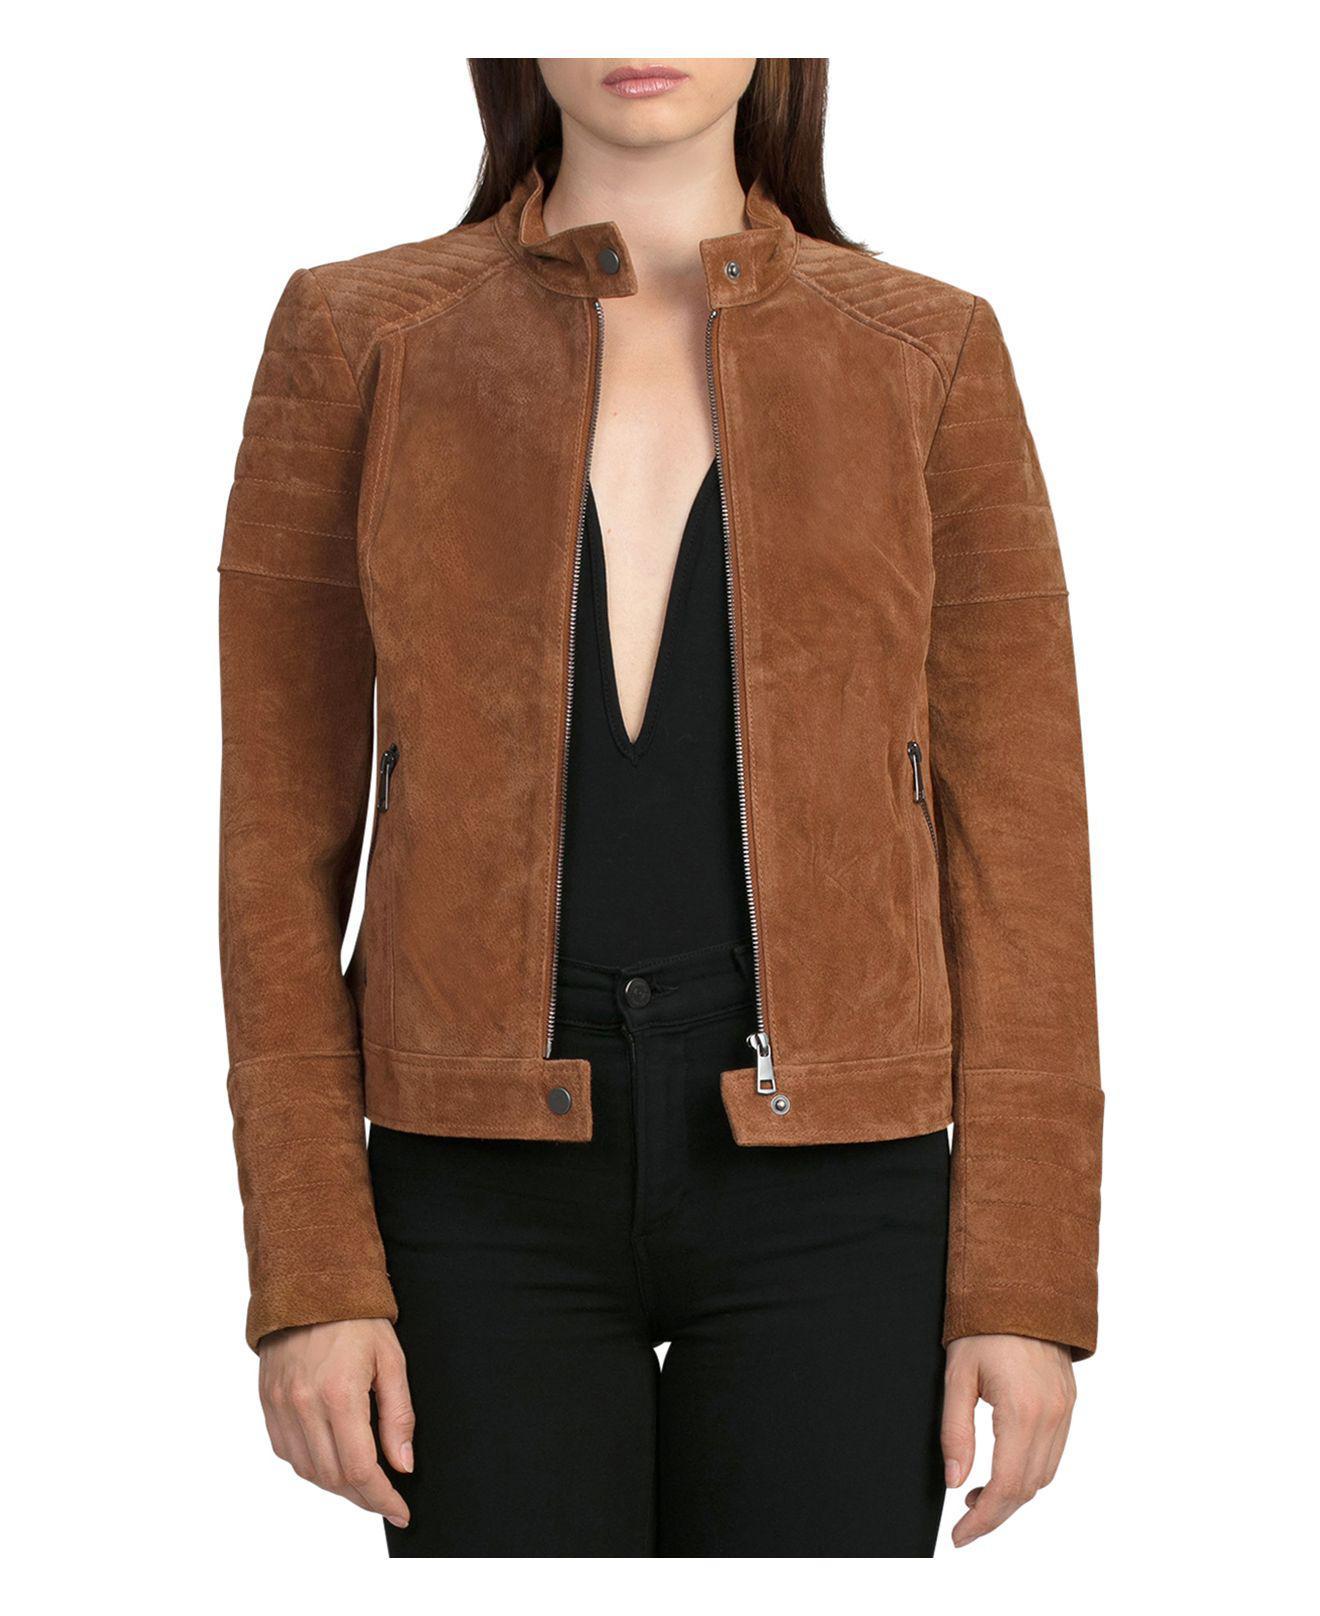 f0cdd17d0e19 https   www.lyst.com clothing loro-piana-martingala-herringbone-long ...